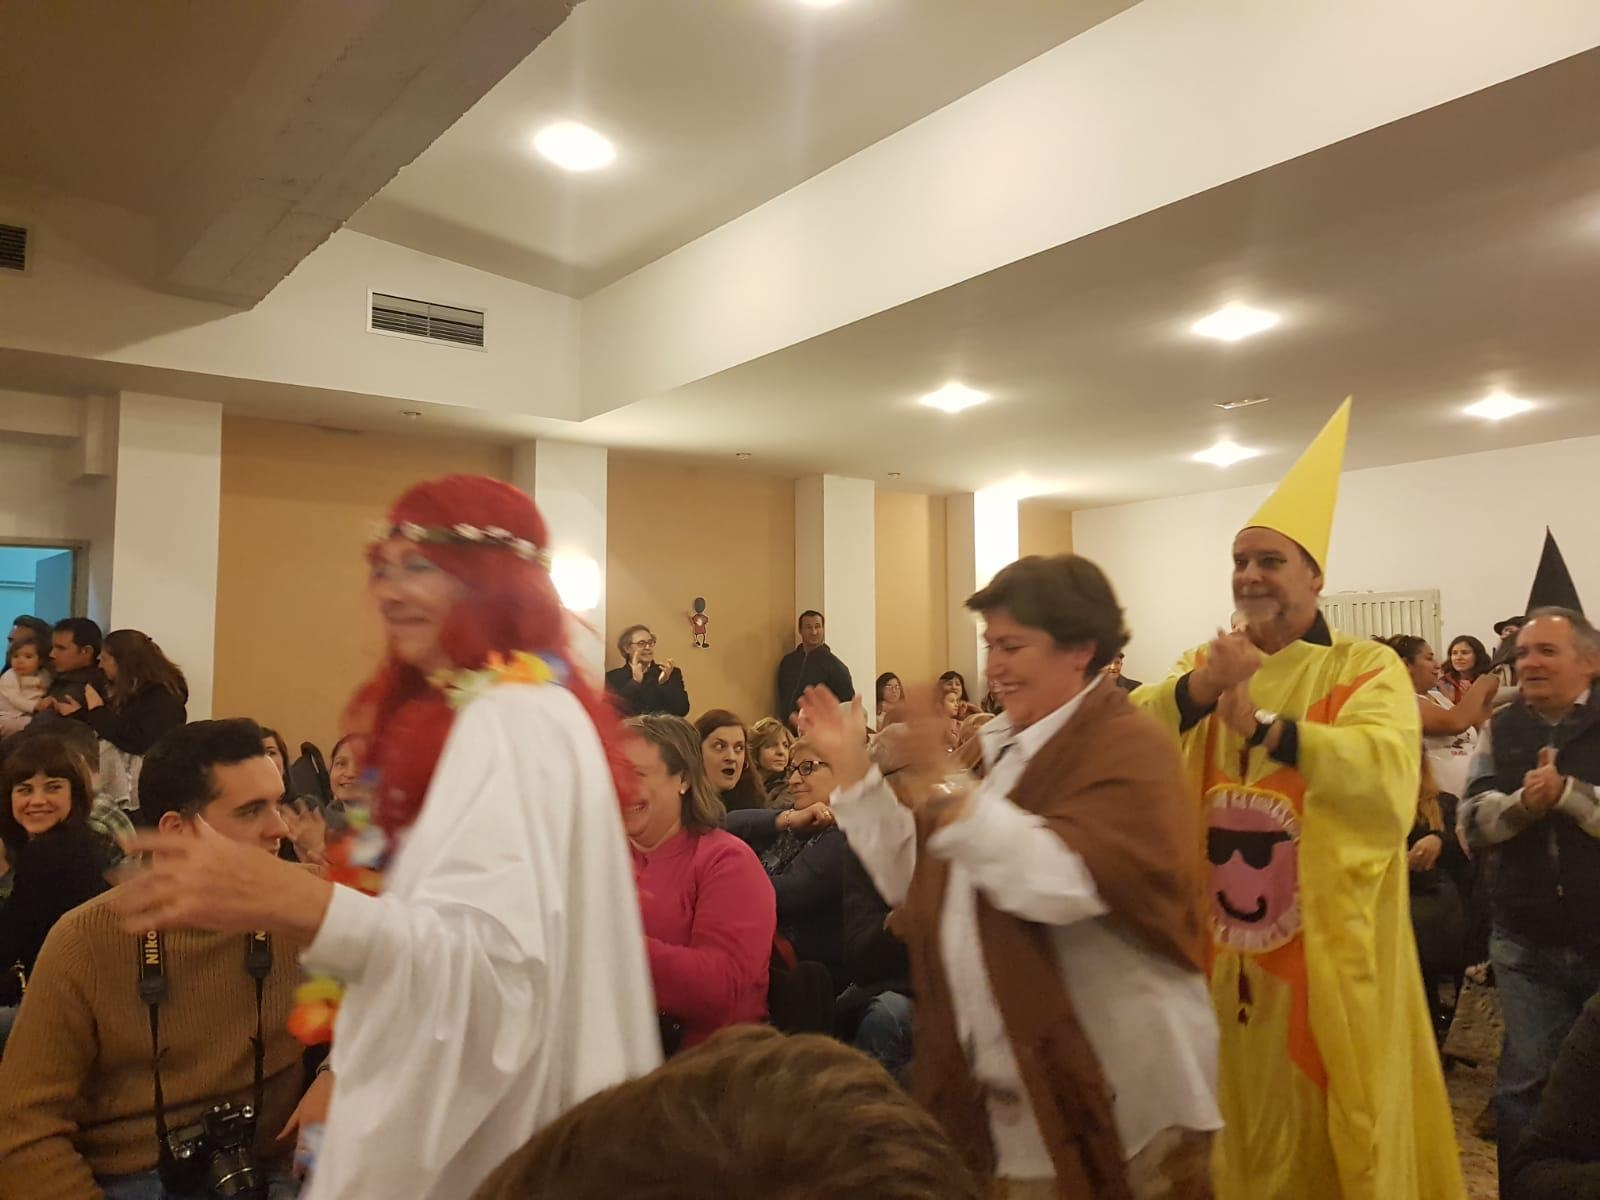 teatro-sange-mago-de-oz-2019-reyes-magos-4